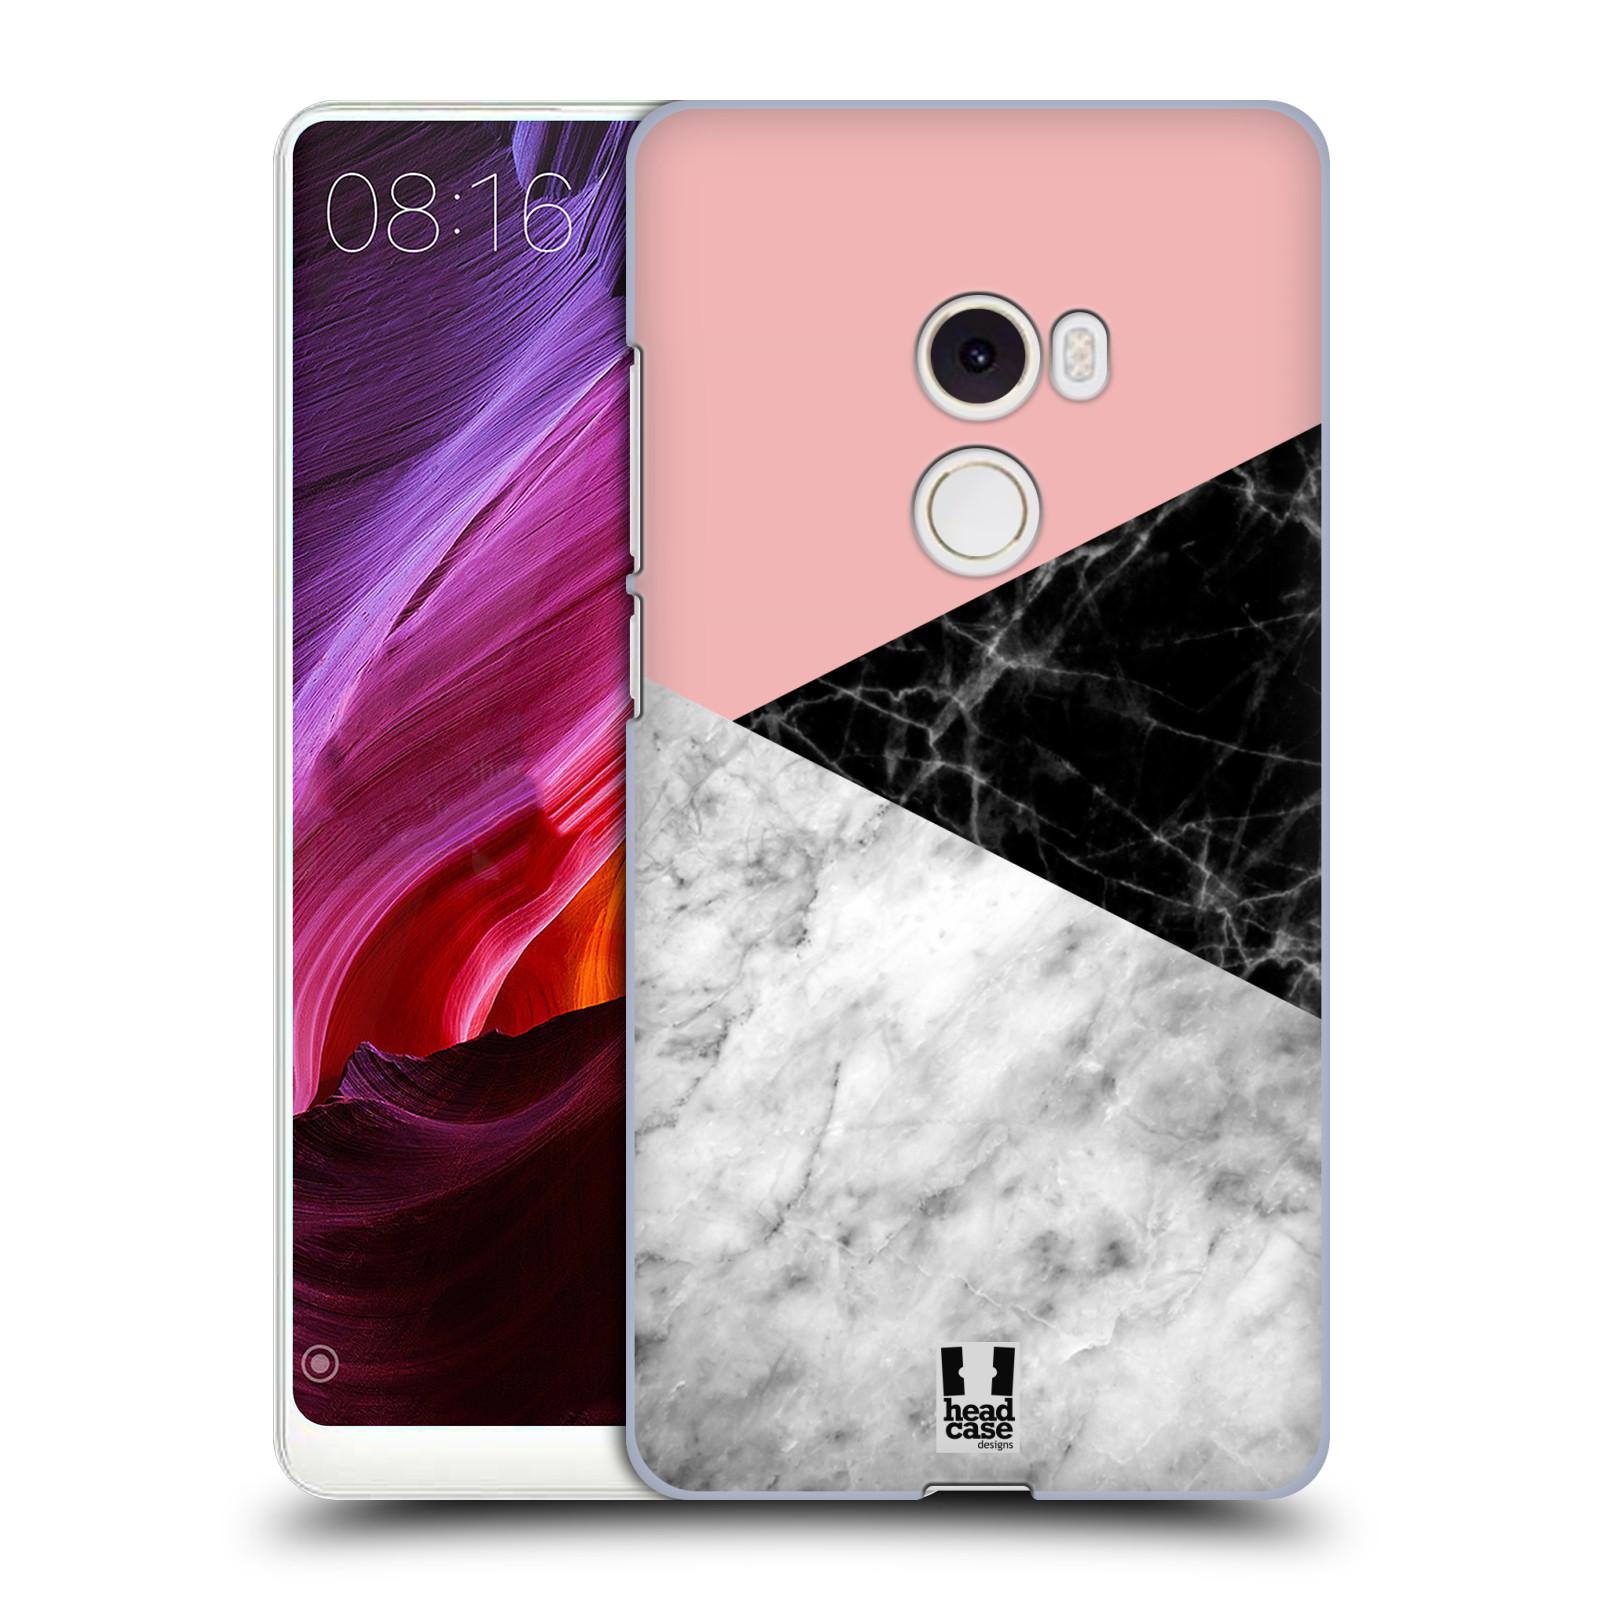 Plastové pouzdro na mobil Xiaomi Mi Mix 2 - Head Case - Mramor mix